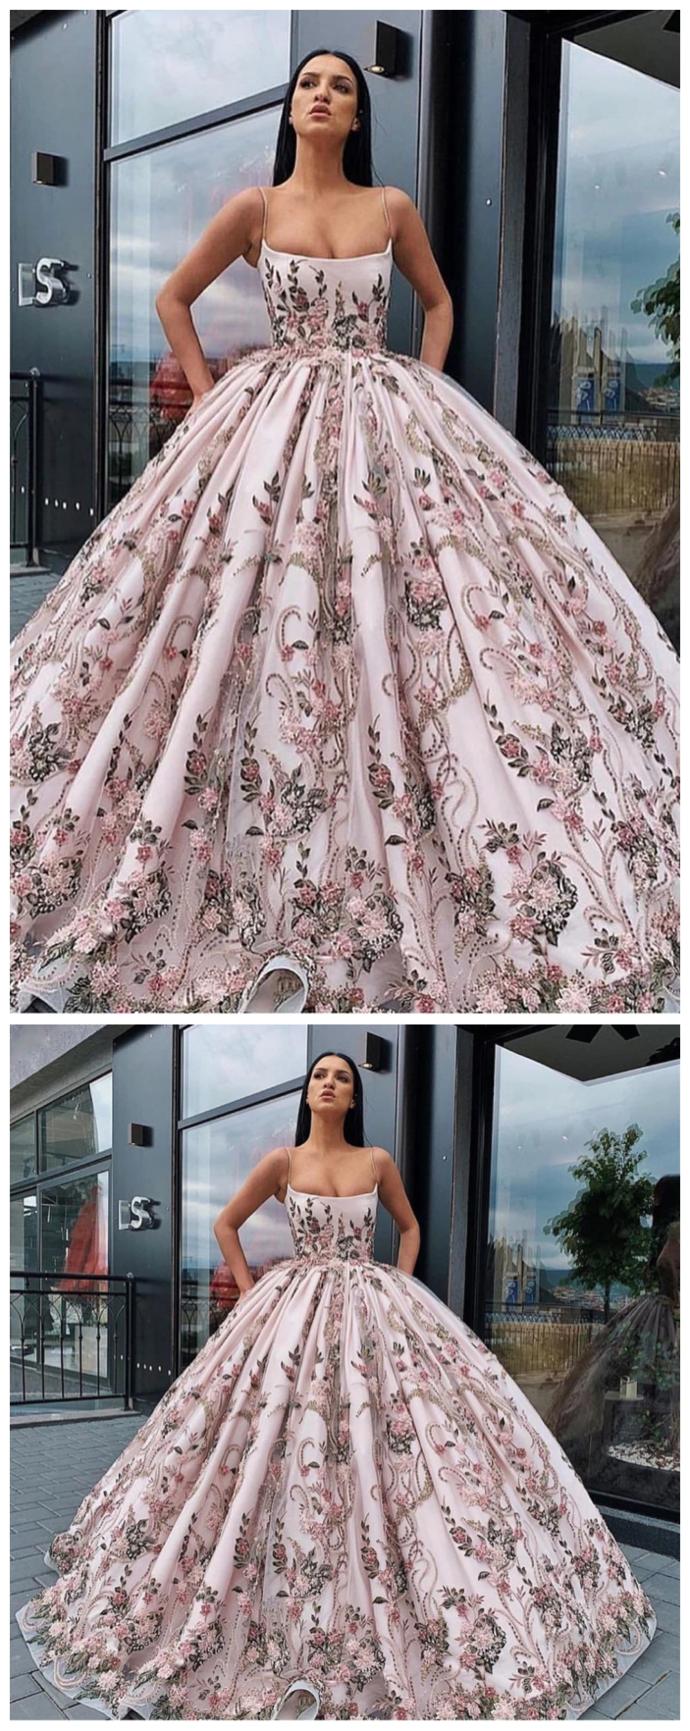 Princess Ball Gown Spaghetti Straps Beads Hotpromdress Floral Print Prom Dress Printed Prom Dresses Princess Ball Gowns [ 1731 x 690 Pixel ]